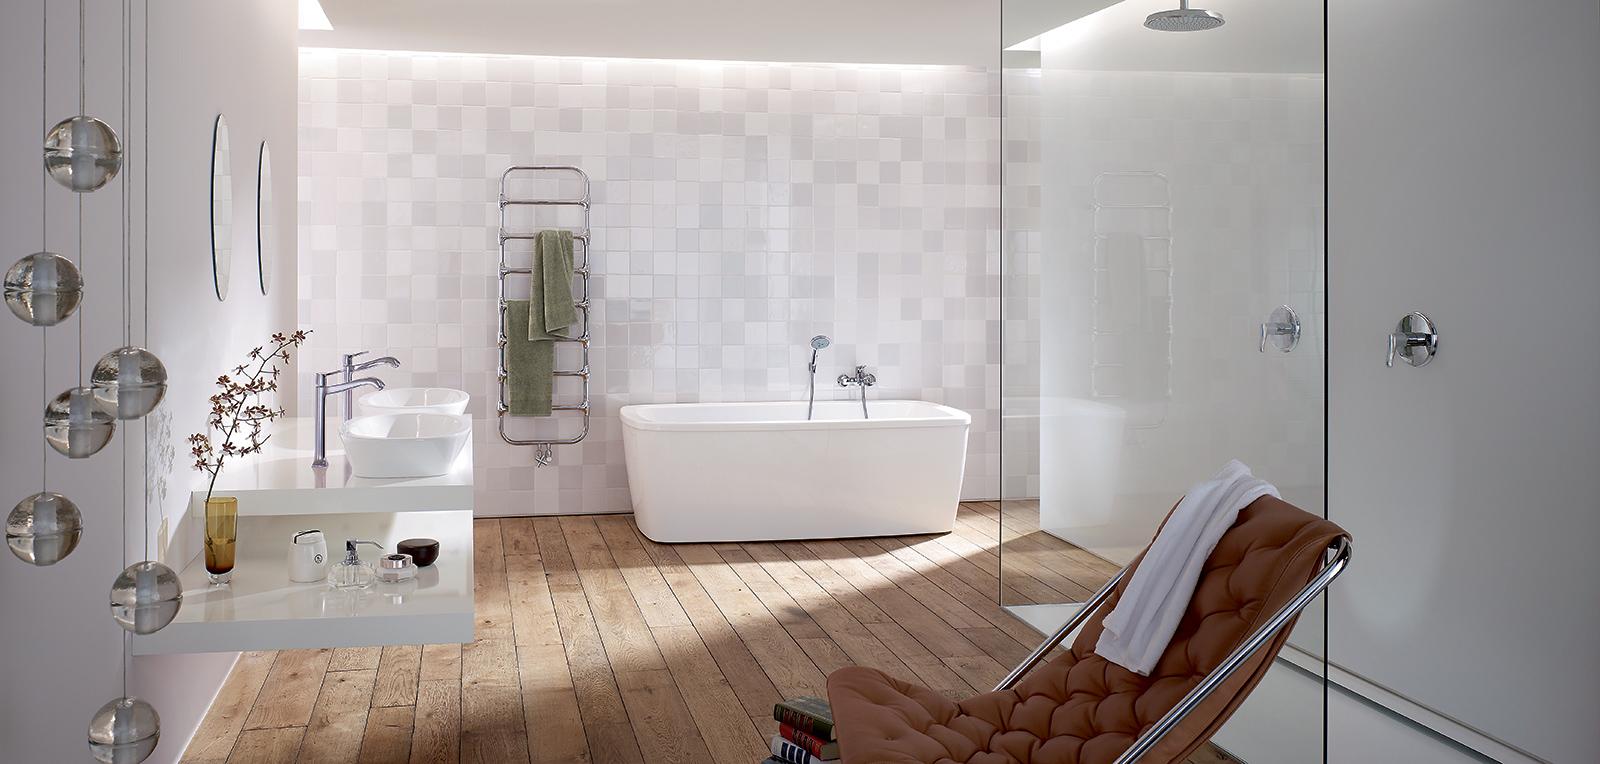 bad wellness gebr der beckmann ihr partner f r bad heizung. Black Bedroom Furniture Sets. Home Design Ideas